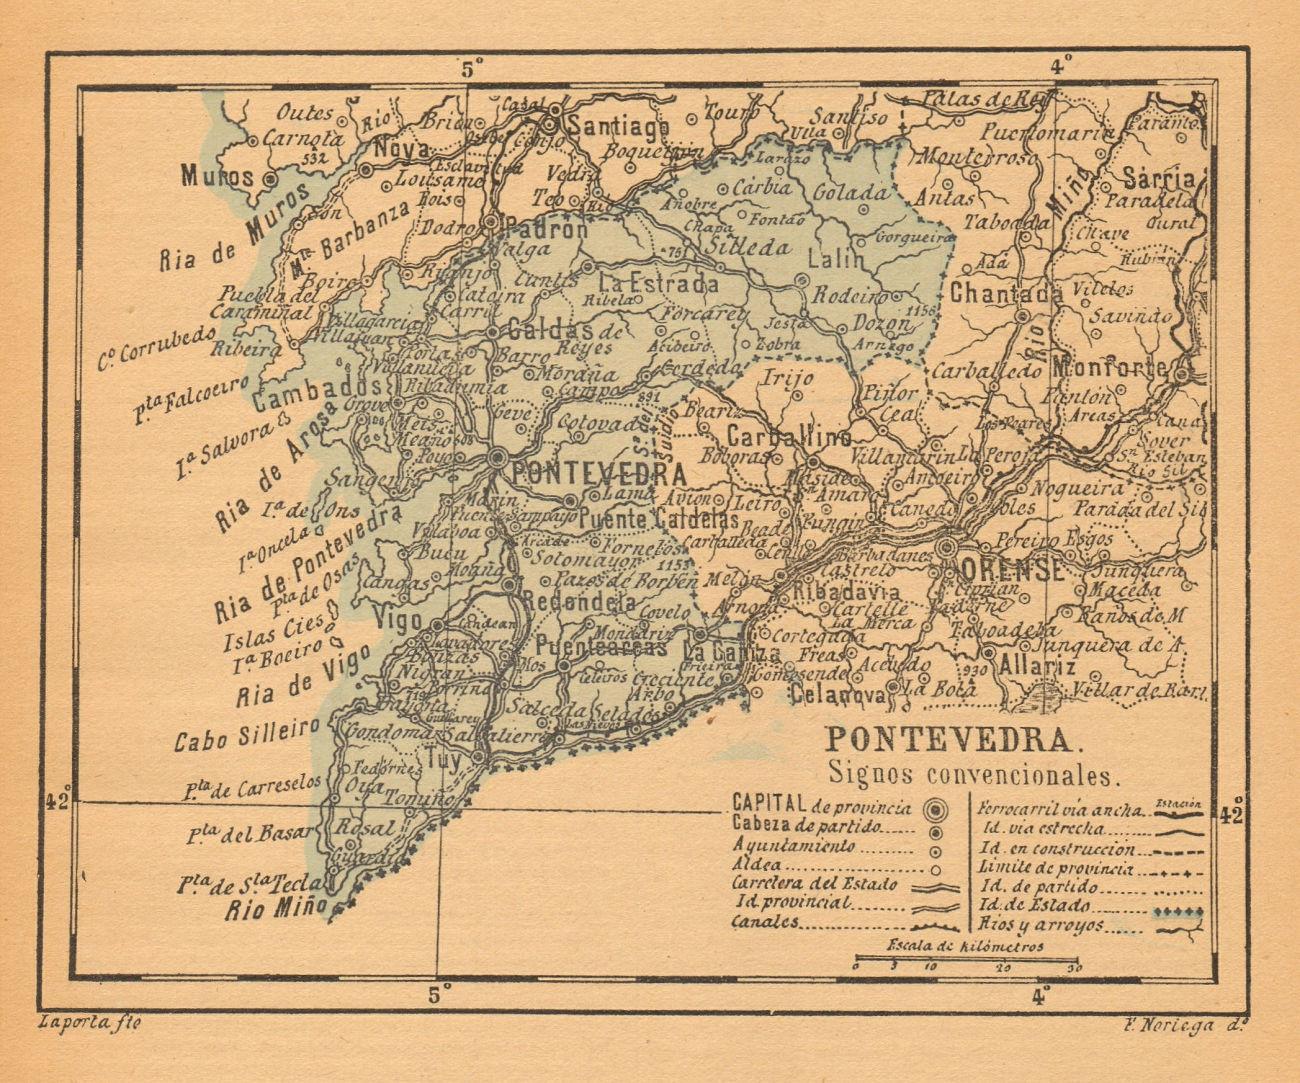 PONTEVEDRA. Galicia. Mapa antiguo de la provincia 1914 old antique chart